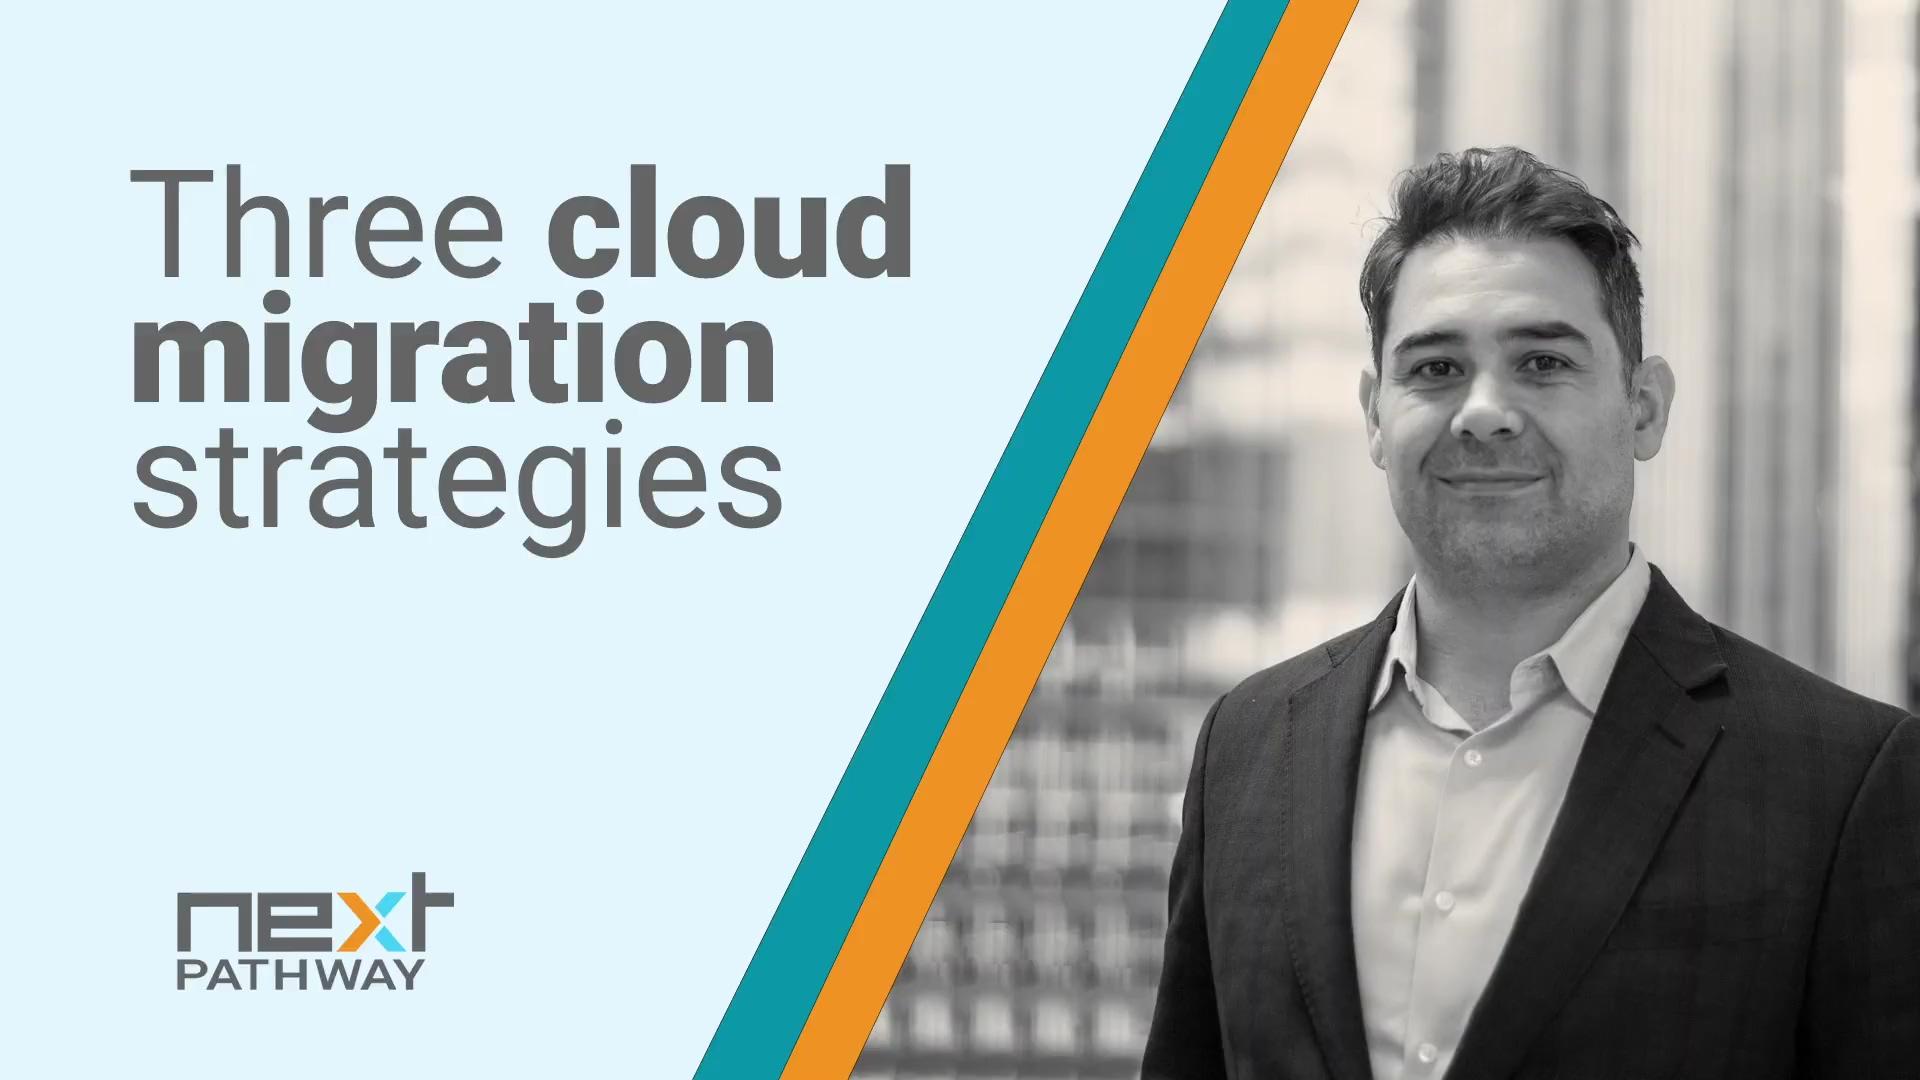 Top 3 Cloud Migration Strategies in 2021